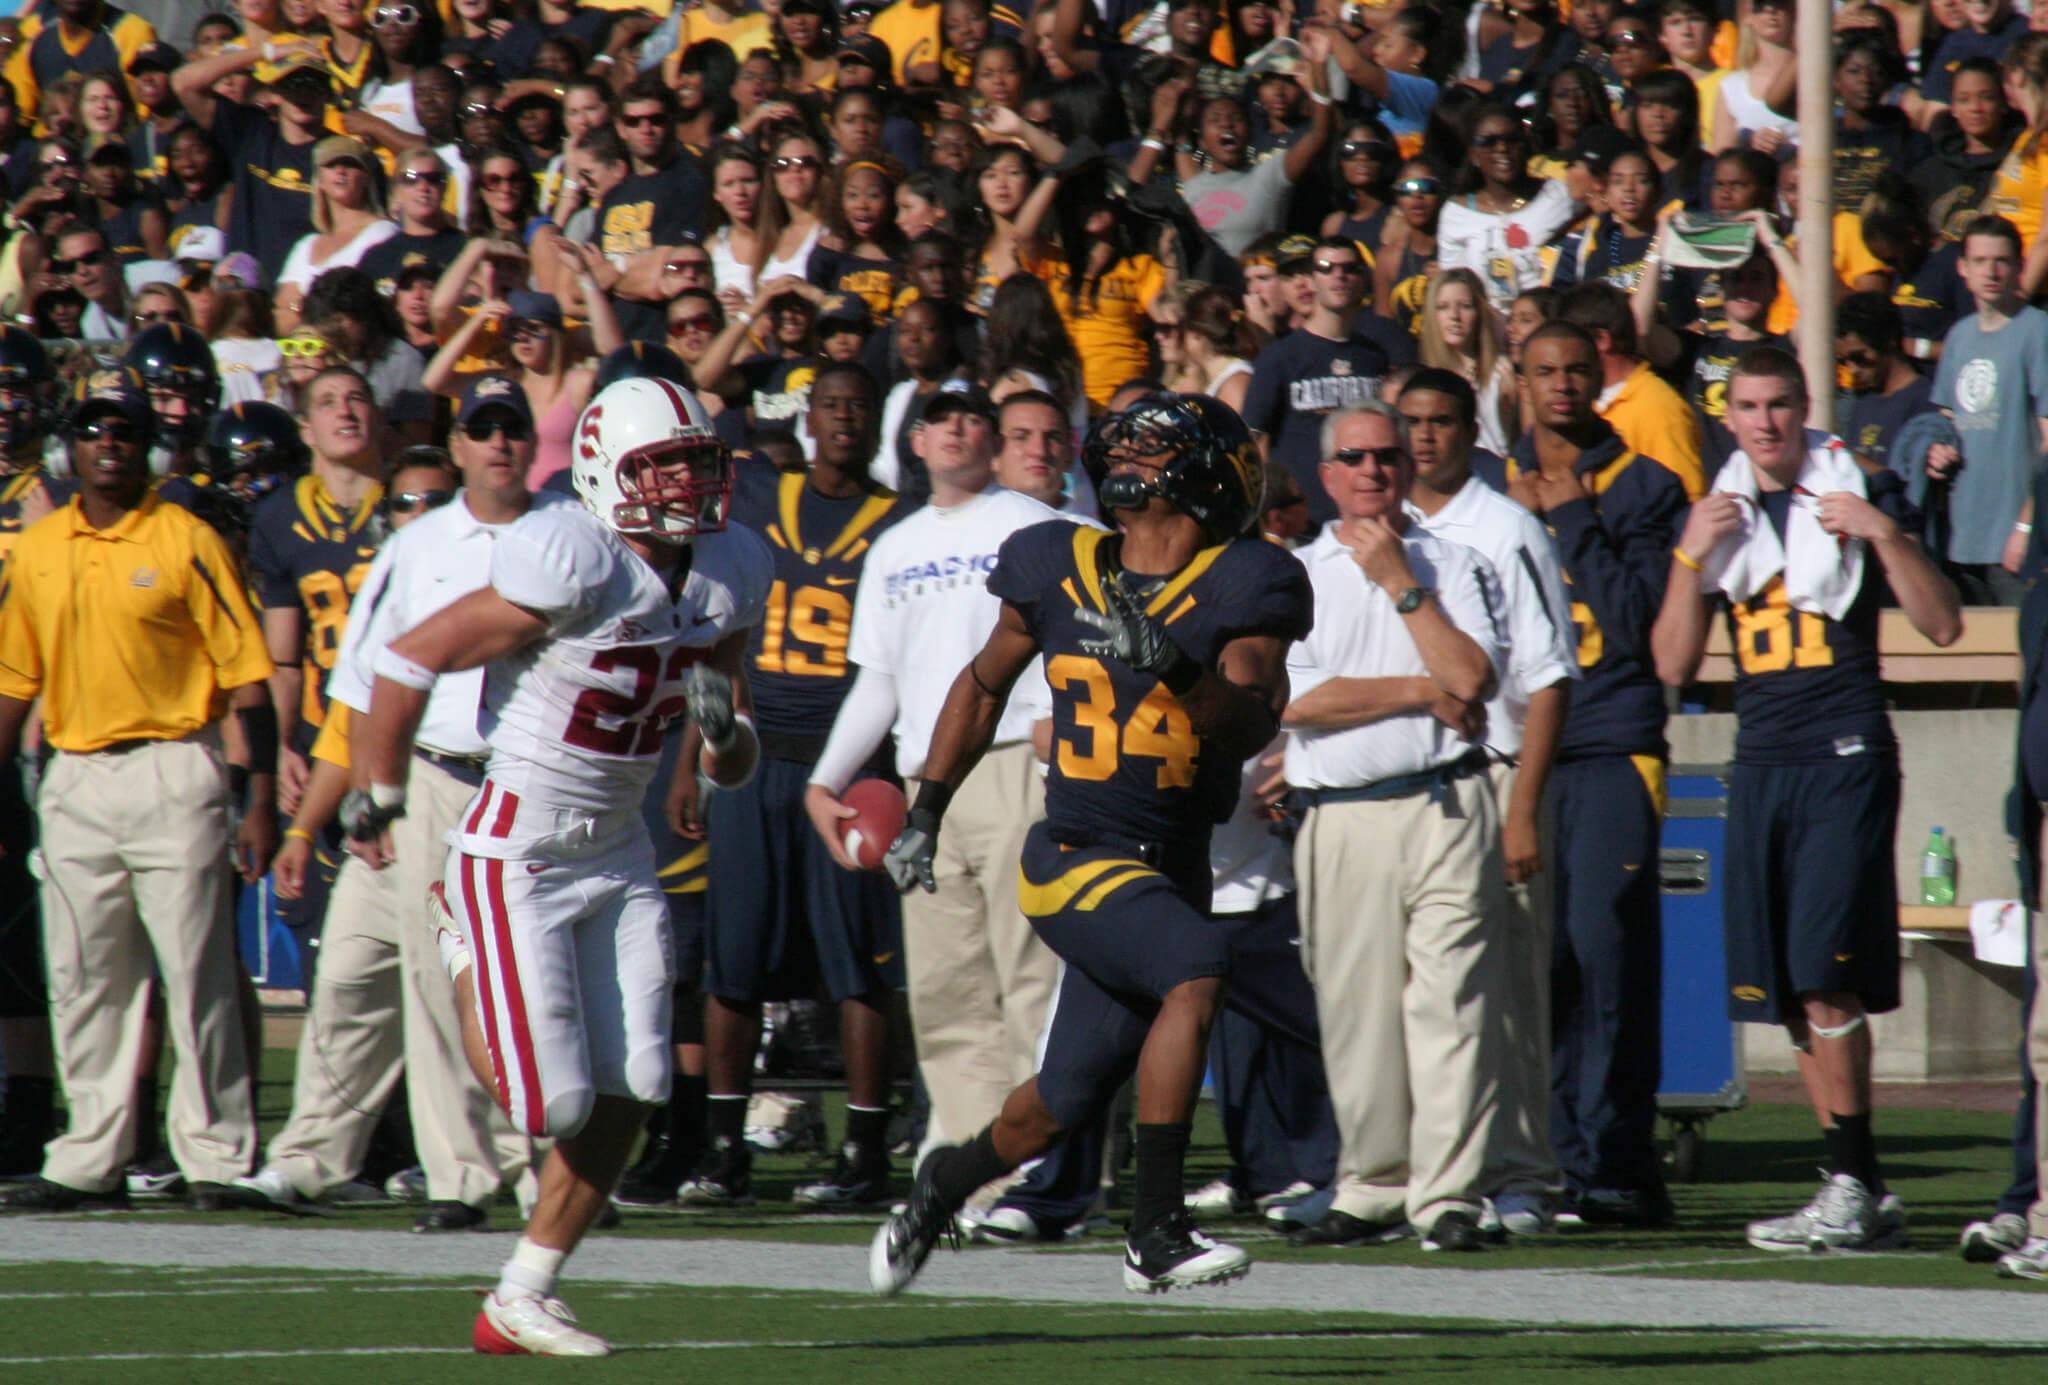 California vs Stanford The Big Game football